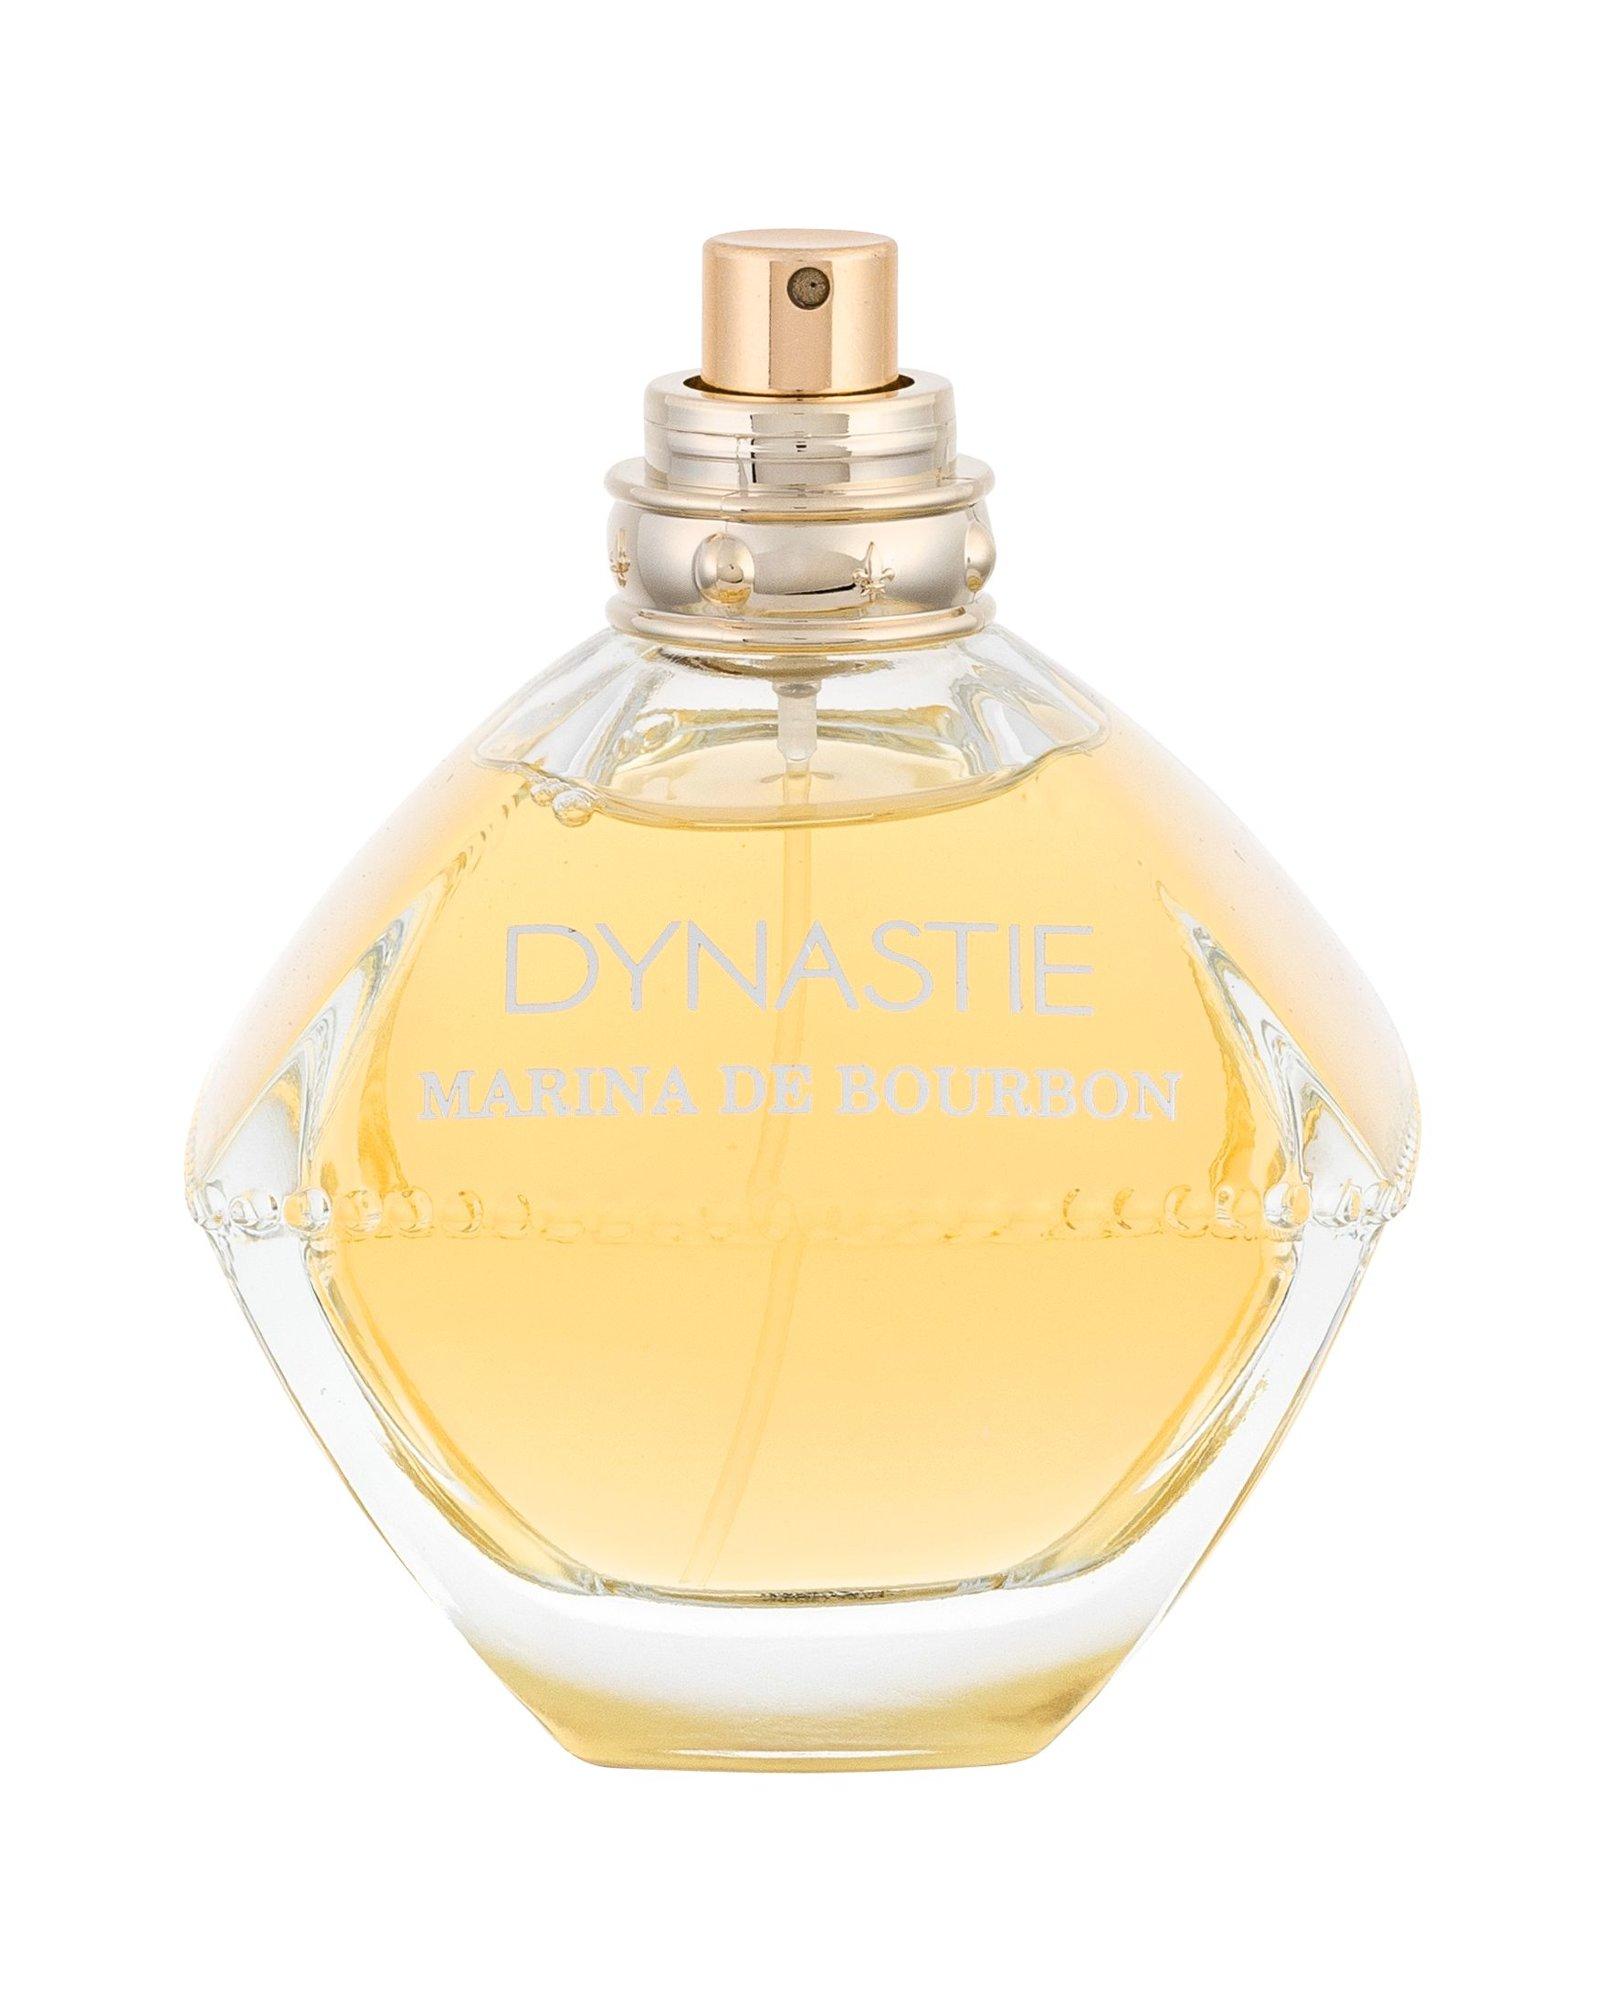 Marina de Bourbon Golden Dynastie Eau de Parfum 100ml